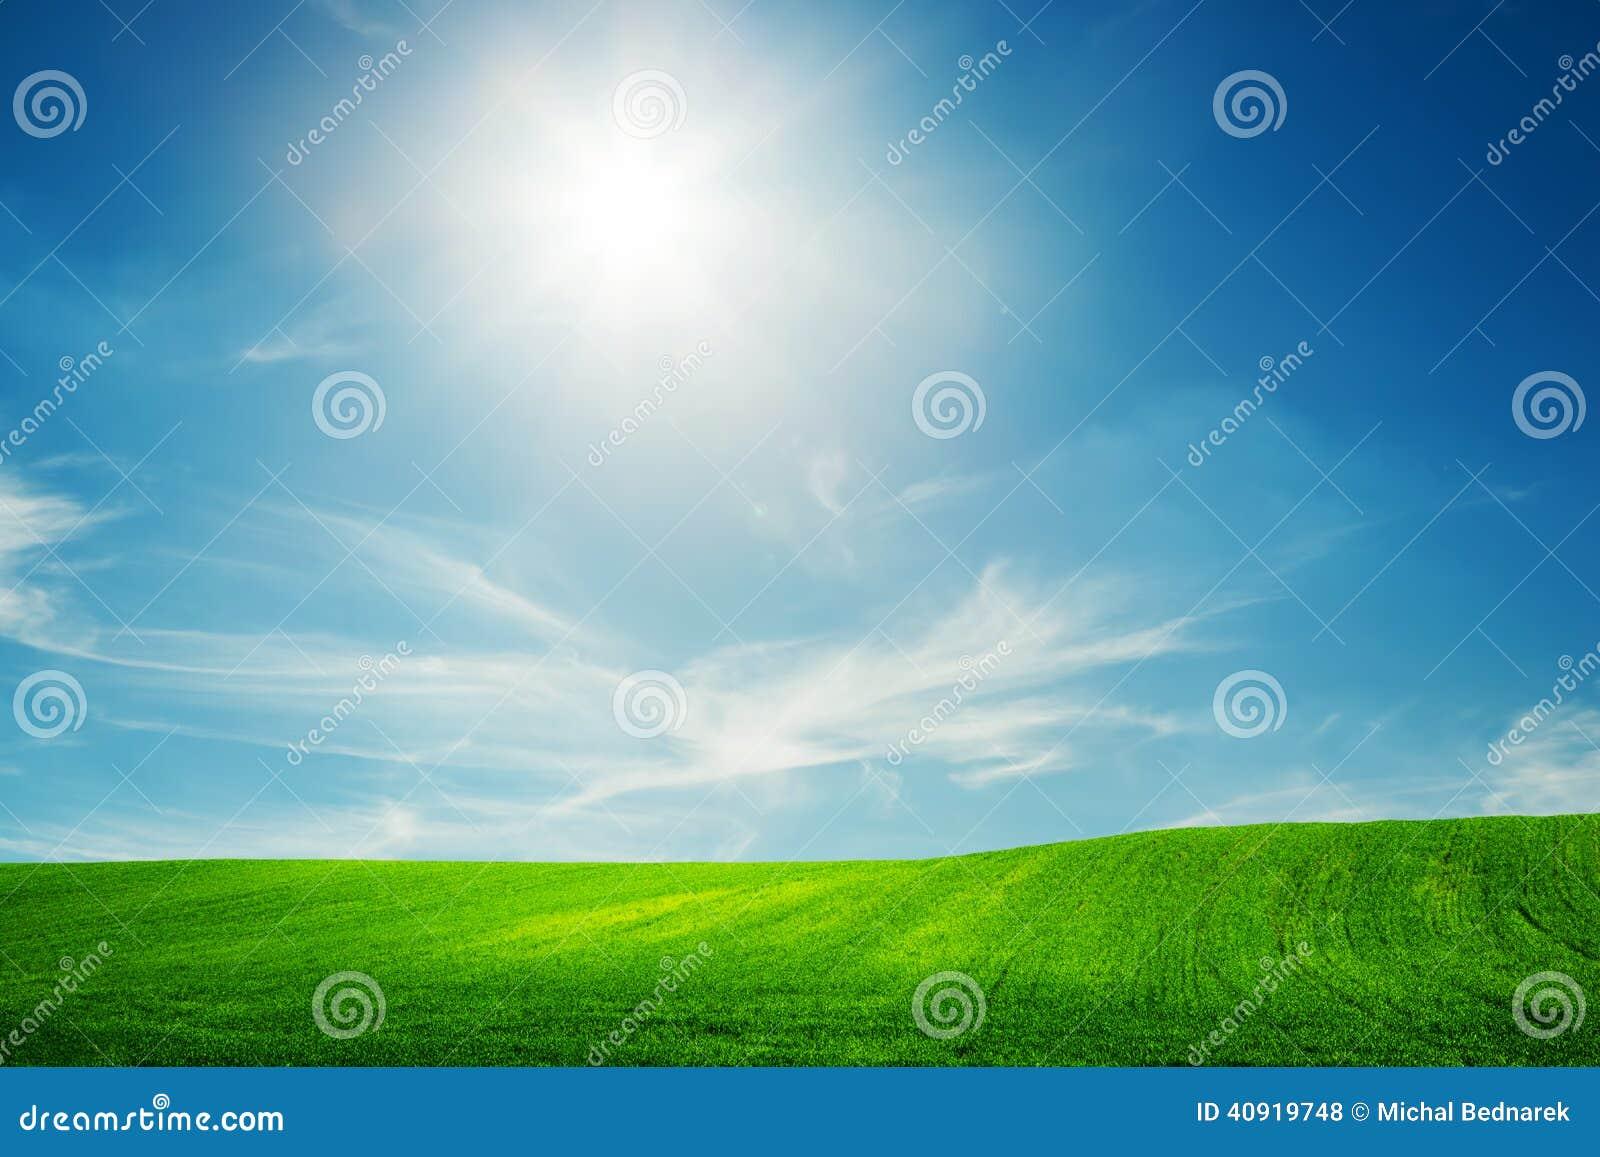 Spring field of green grass. Blue sunny sky